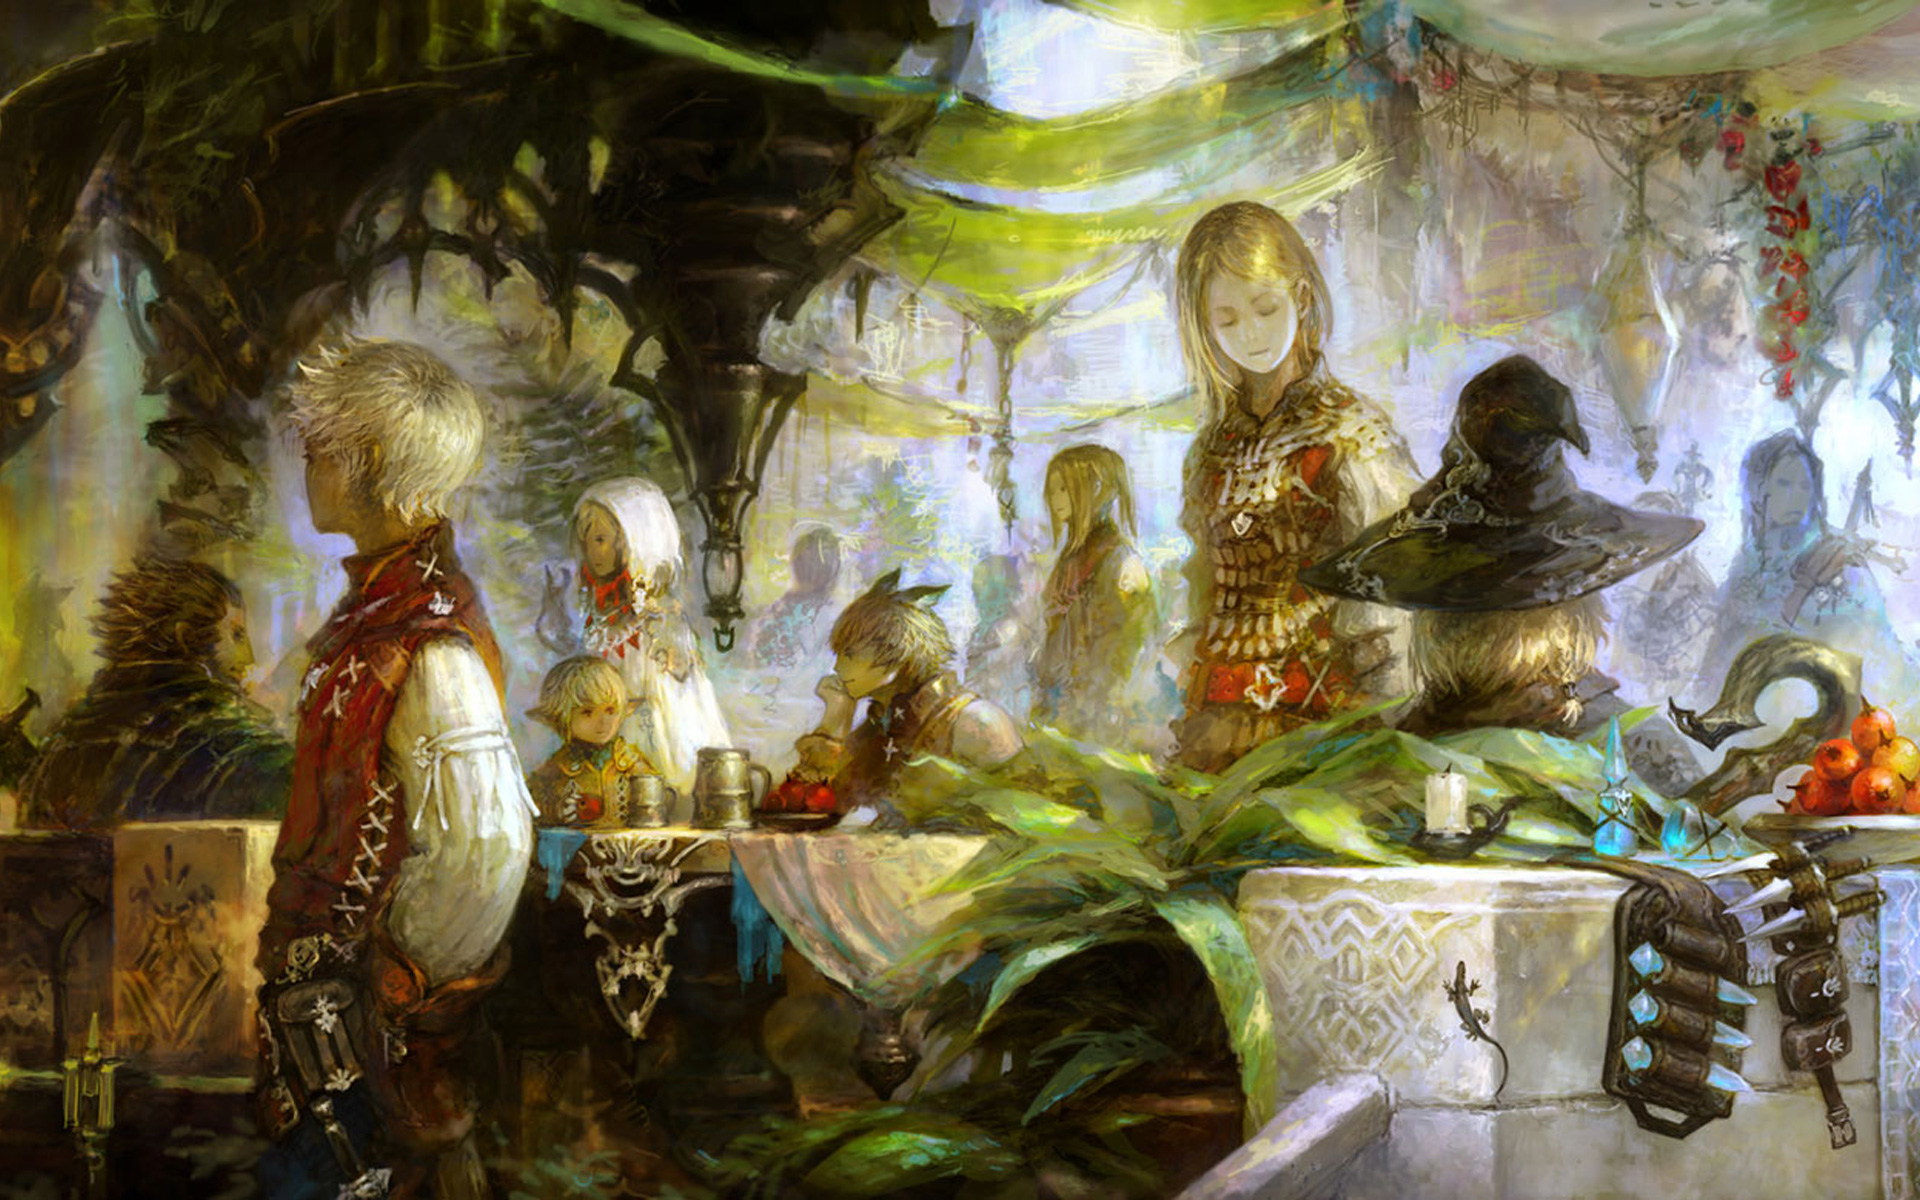 Free Final Fantasy XIV Wallpaper in 1920x1200